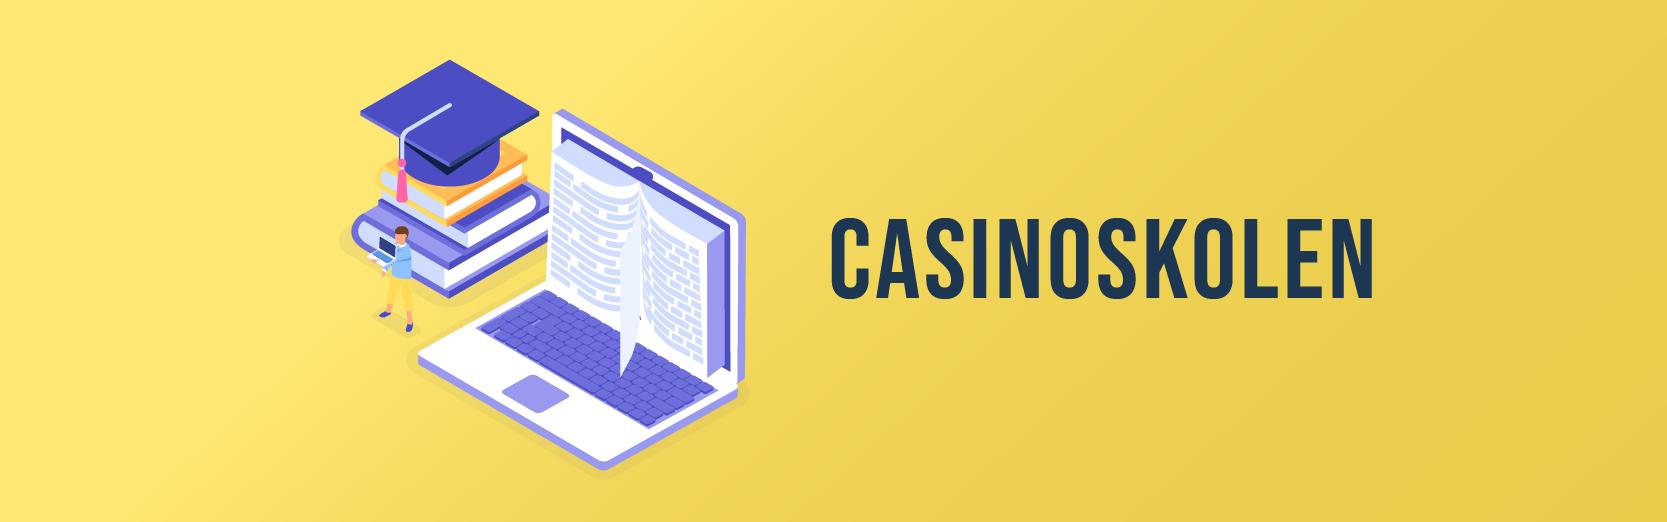 casinoskolen casinospeisalisten